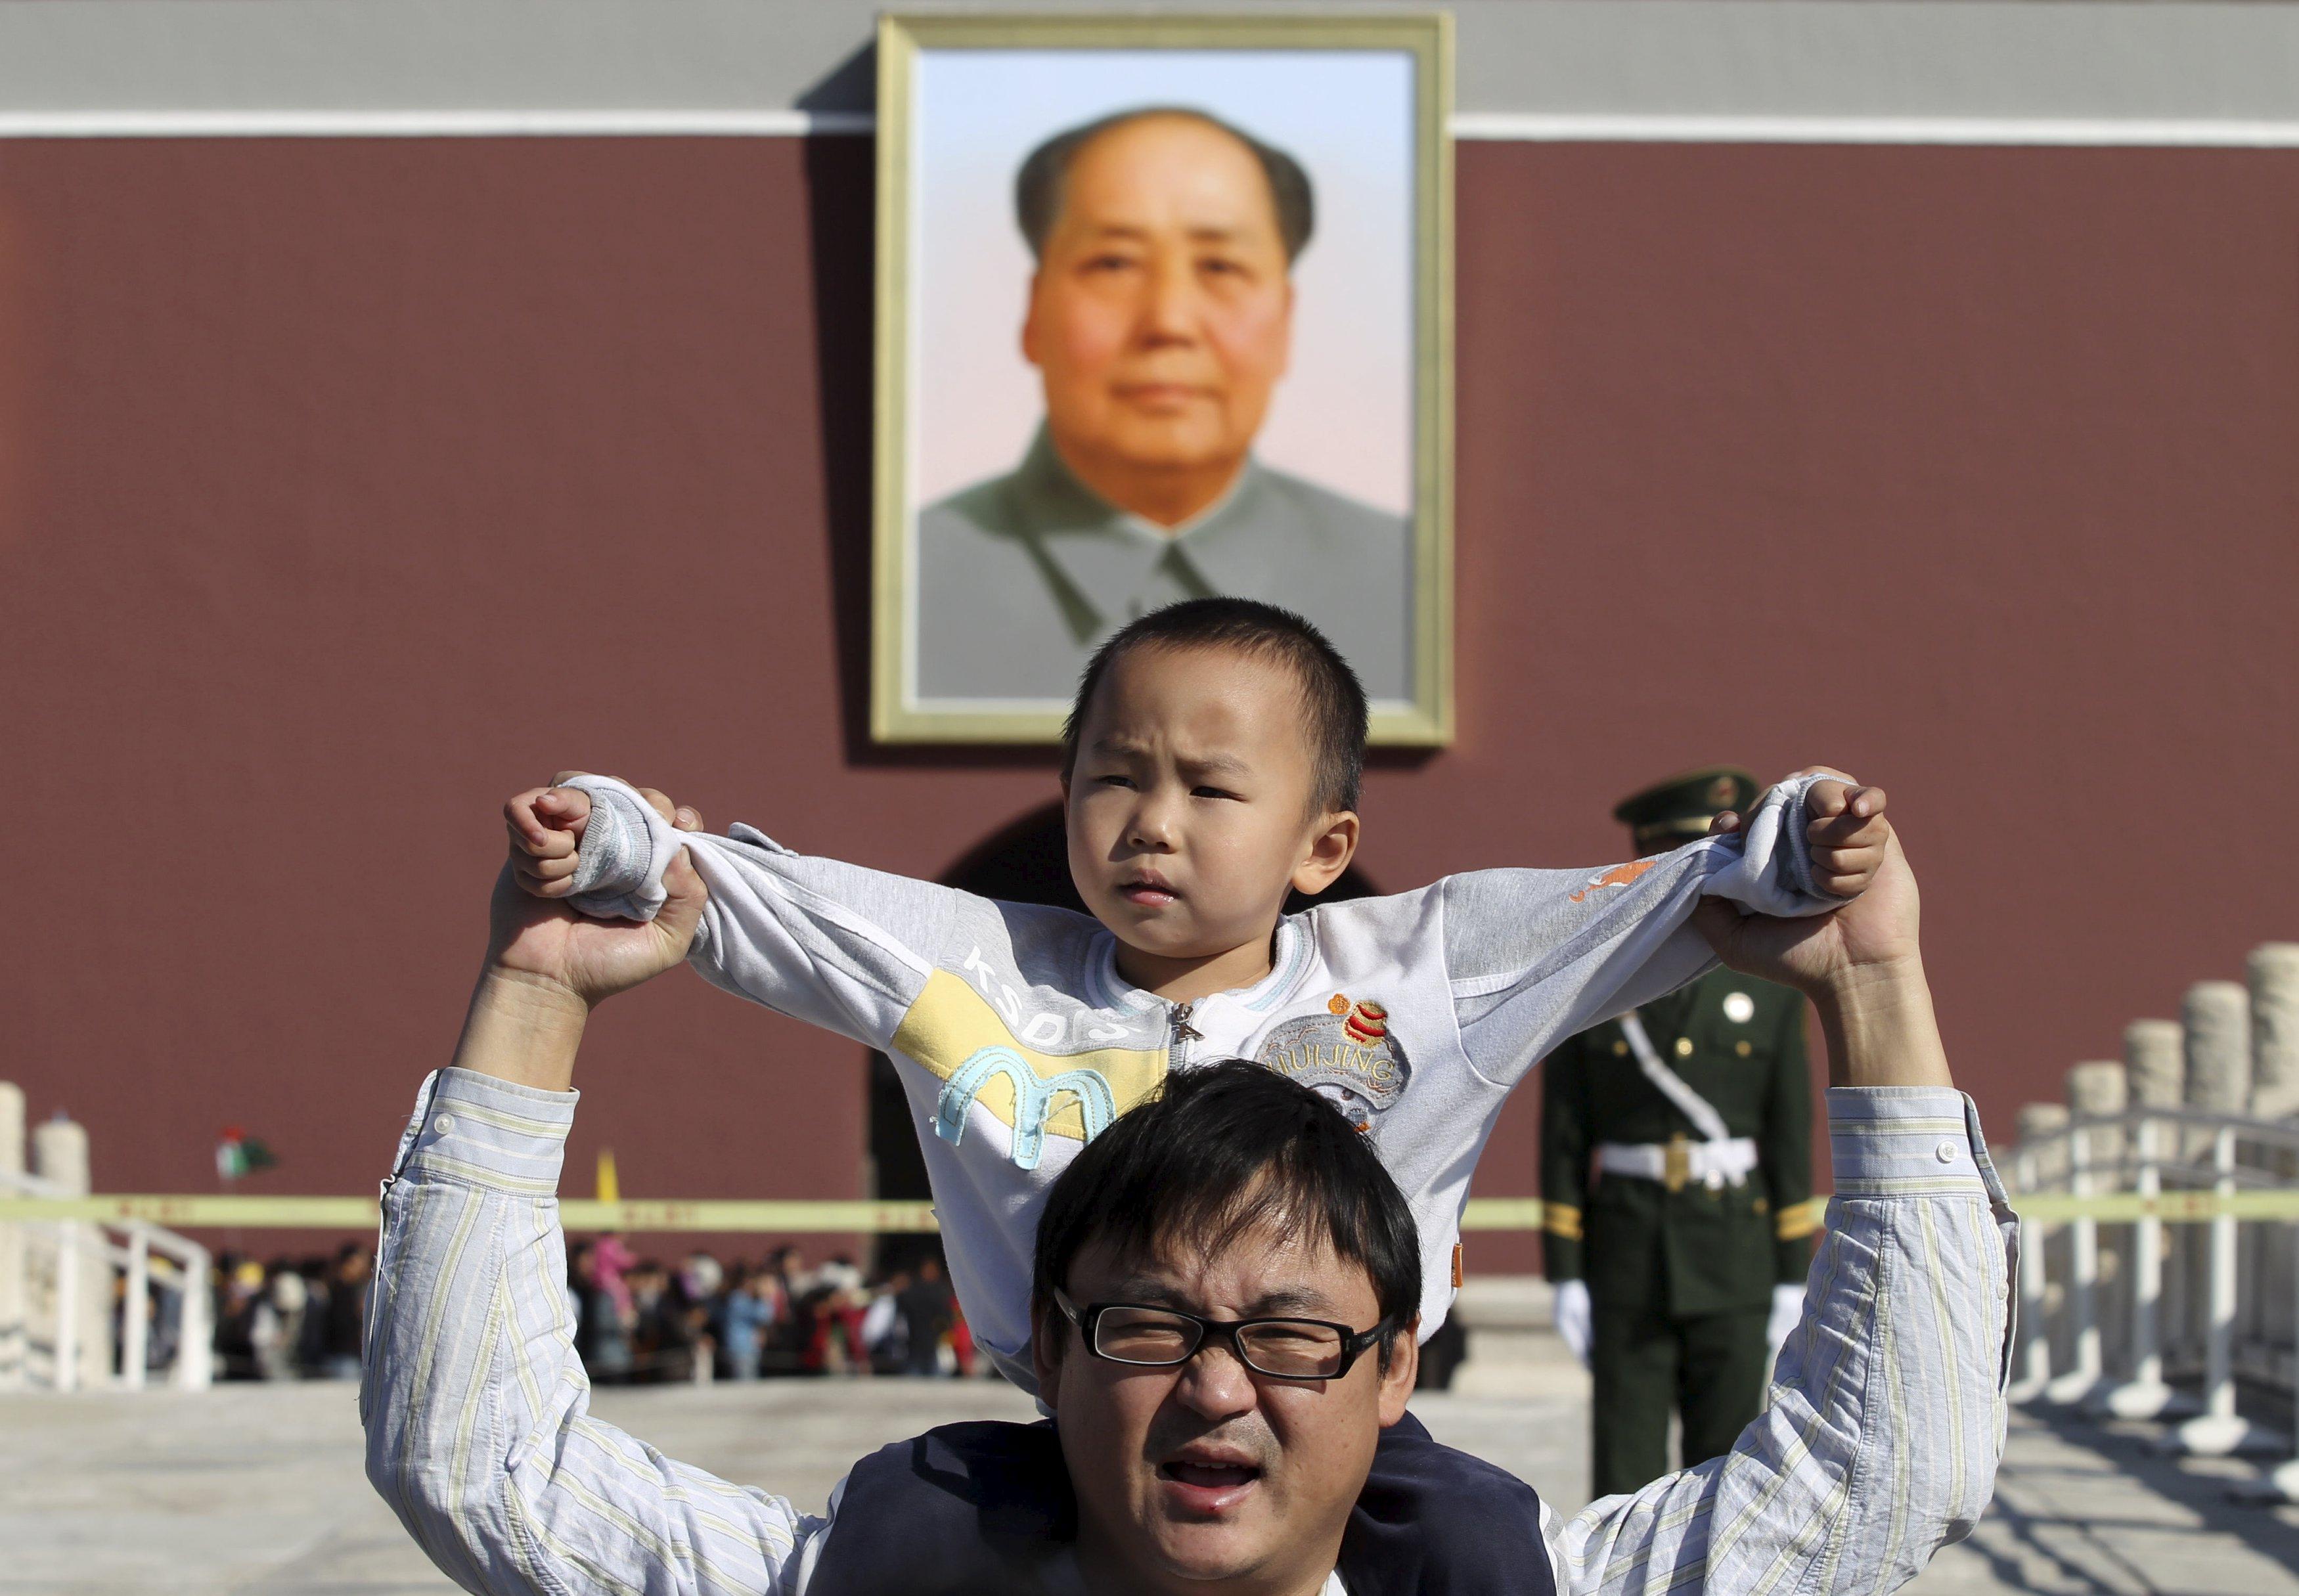 Anak laki-laki duduk di bahu ayahnya saat berpose di depan foto raksasa Mao Zedong di lapangan Tiananmen, Beijing, Tiongkok, 2 Oktober 2011. Tiongkok mengurangi pembatasan keluarga berencana dengan memperbolehkan keluarga memiliki dua anak setelah puluhan tahun menerapkan kebijakan satu anak dengan ketat, menurut Partai Komunis berkuasa pada hari Kamis (29/10), langkah yang ditujukan untuk menambah angka penduduk dalam perkembangan ekonomi. Foto diambil pada tanggal 2 Oktober 2011. REUTERS/Stringer.